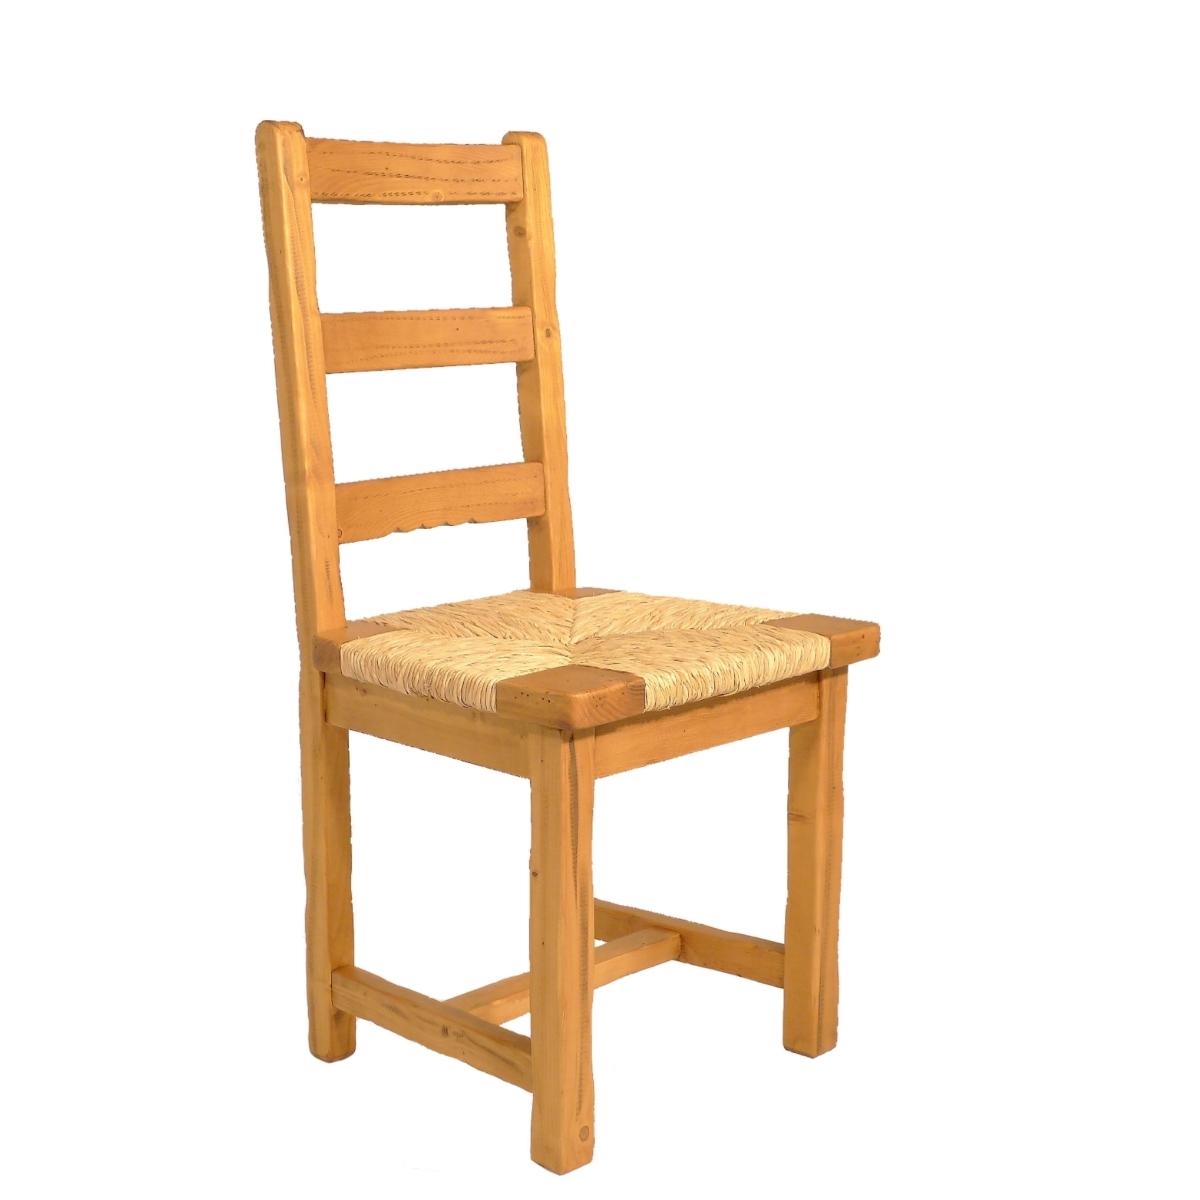 Silla baja r stica asiento anea natural ecor stico venta online muebles de madera - Sillas rusticas ...